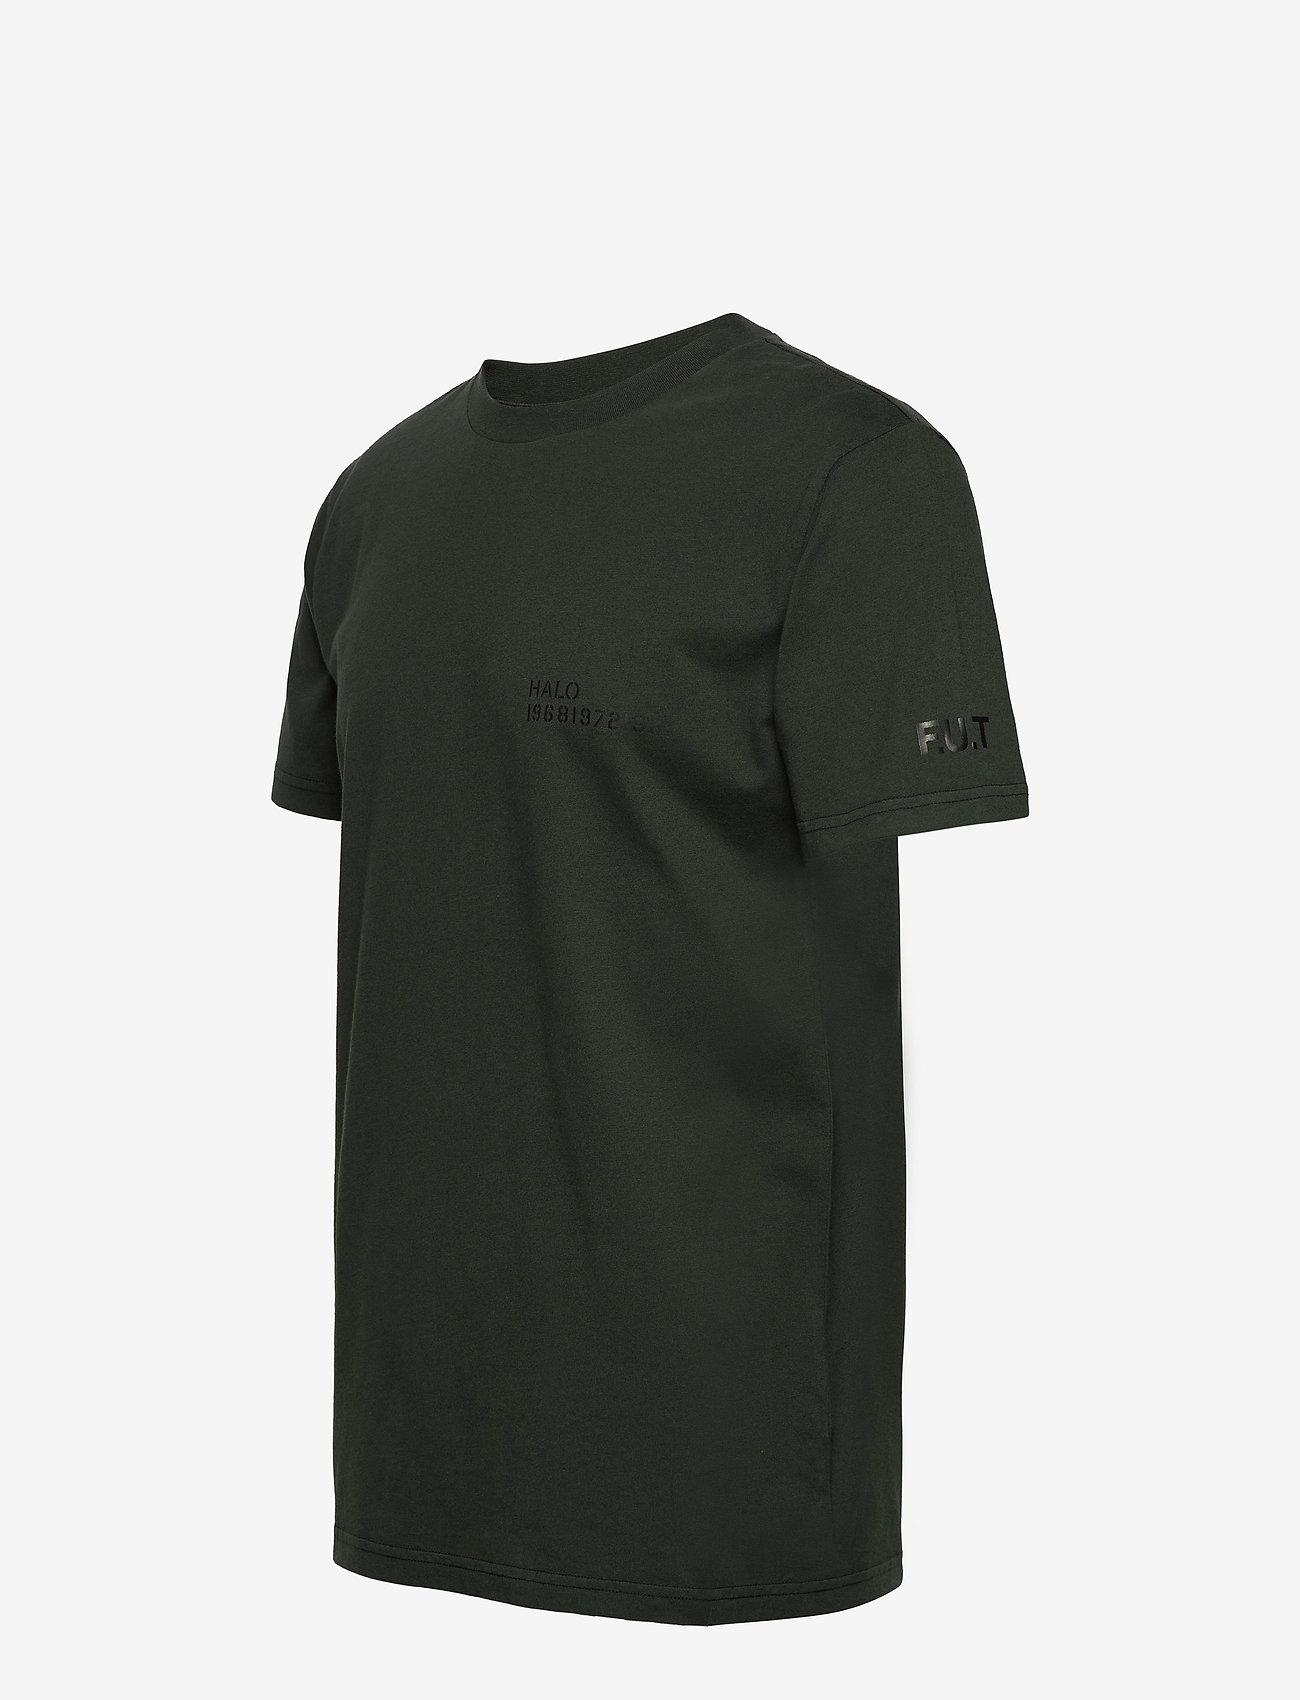 HALO HALO Cotton Tee - T-skjorter DEEP FOREST - Menn Klær